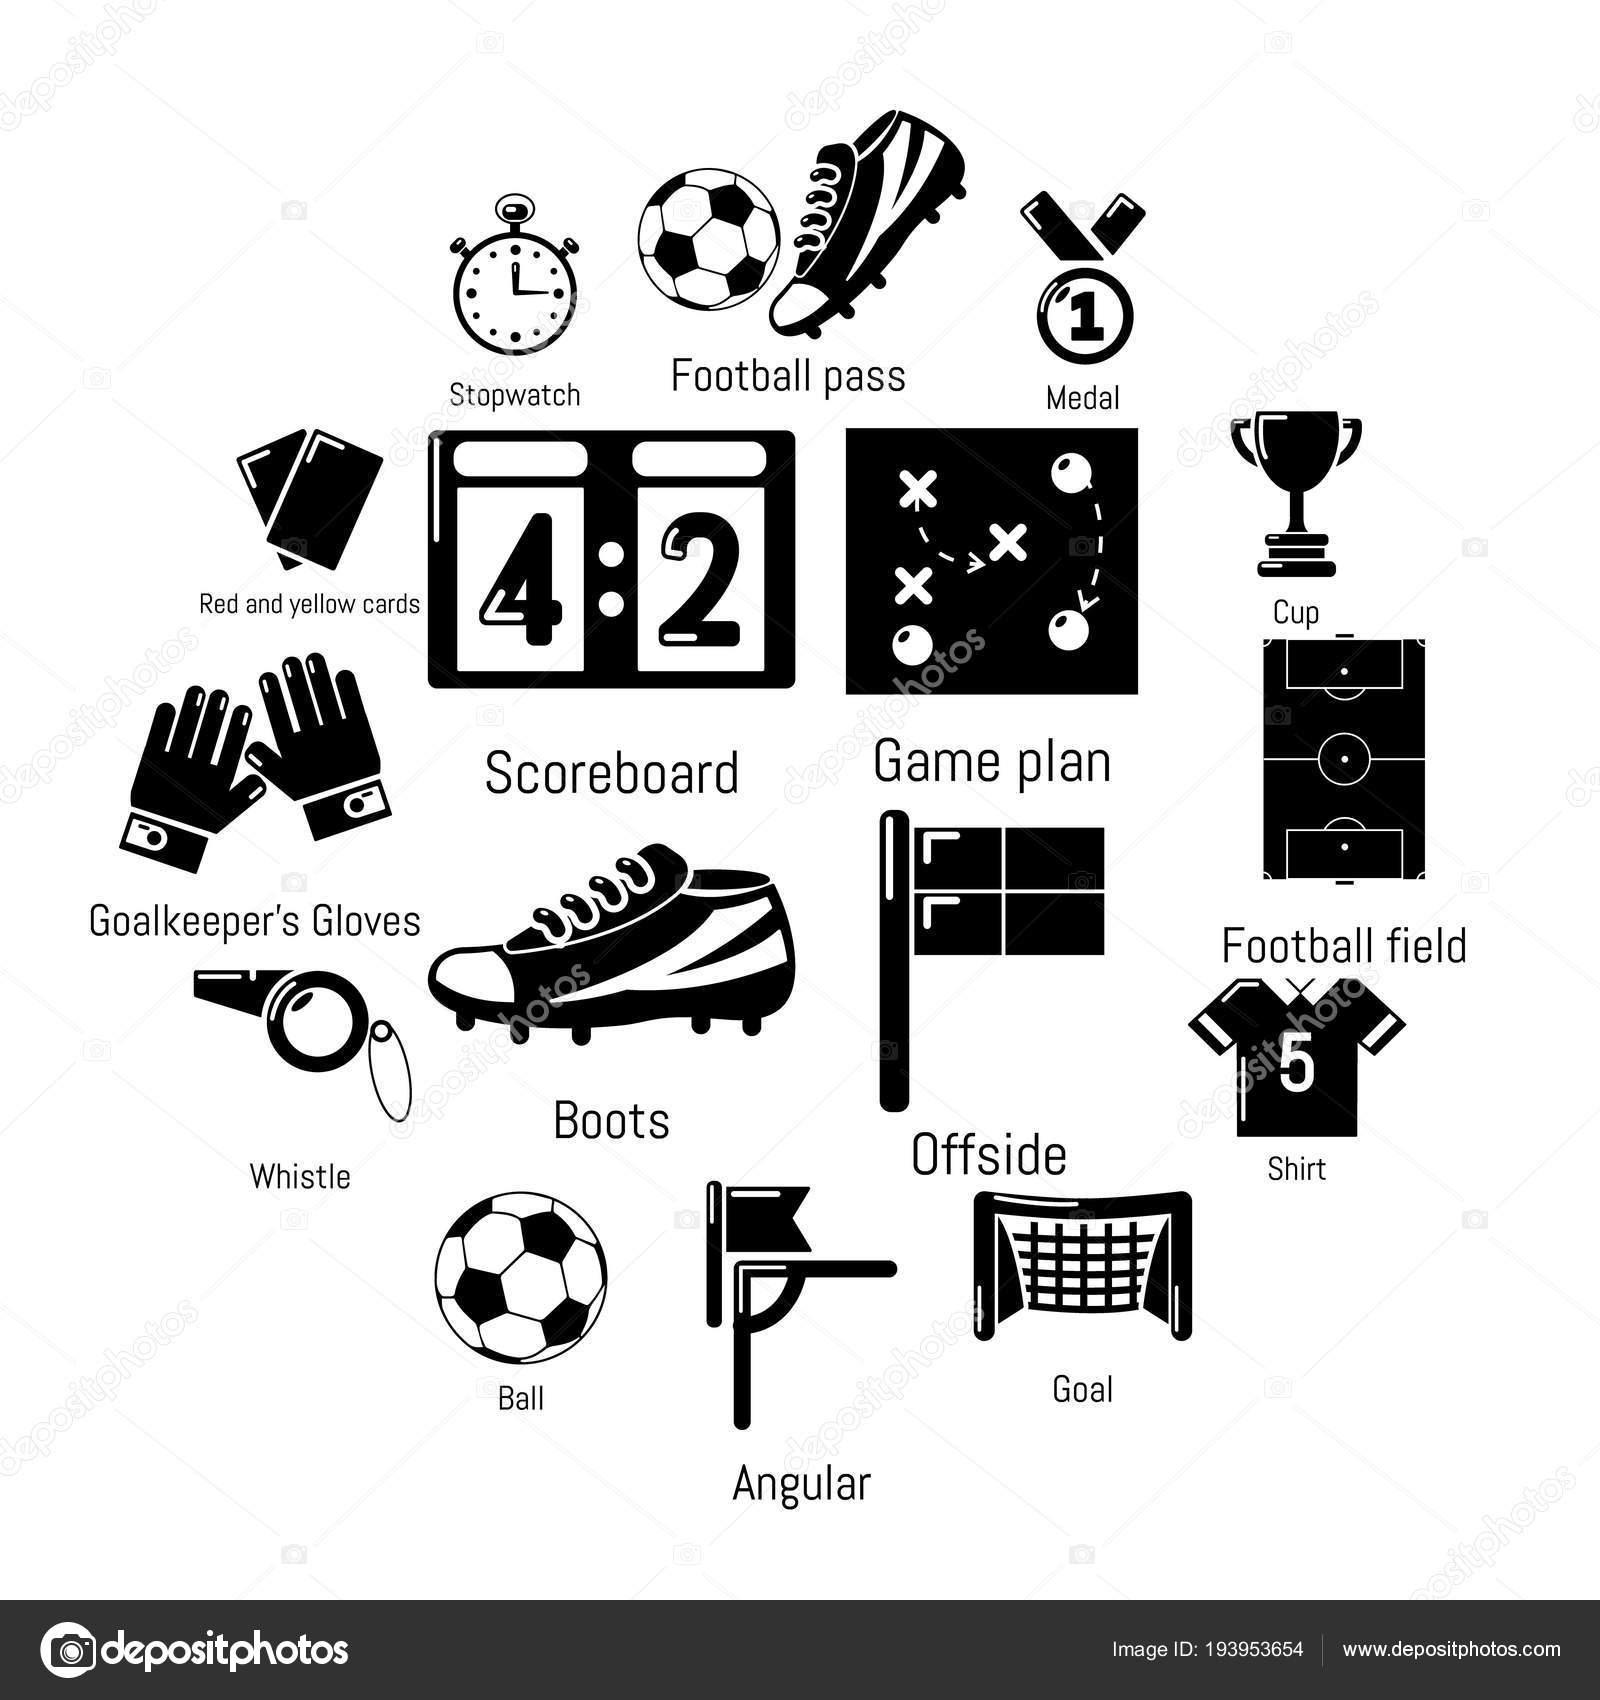 Fussball Fussball Icons Set Einfachen Stil Stockvektor